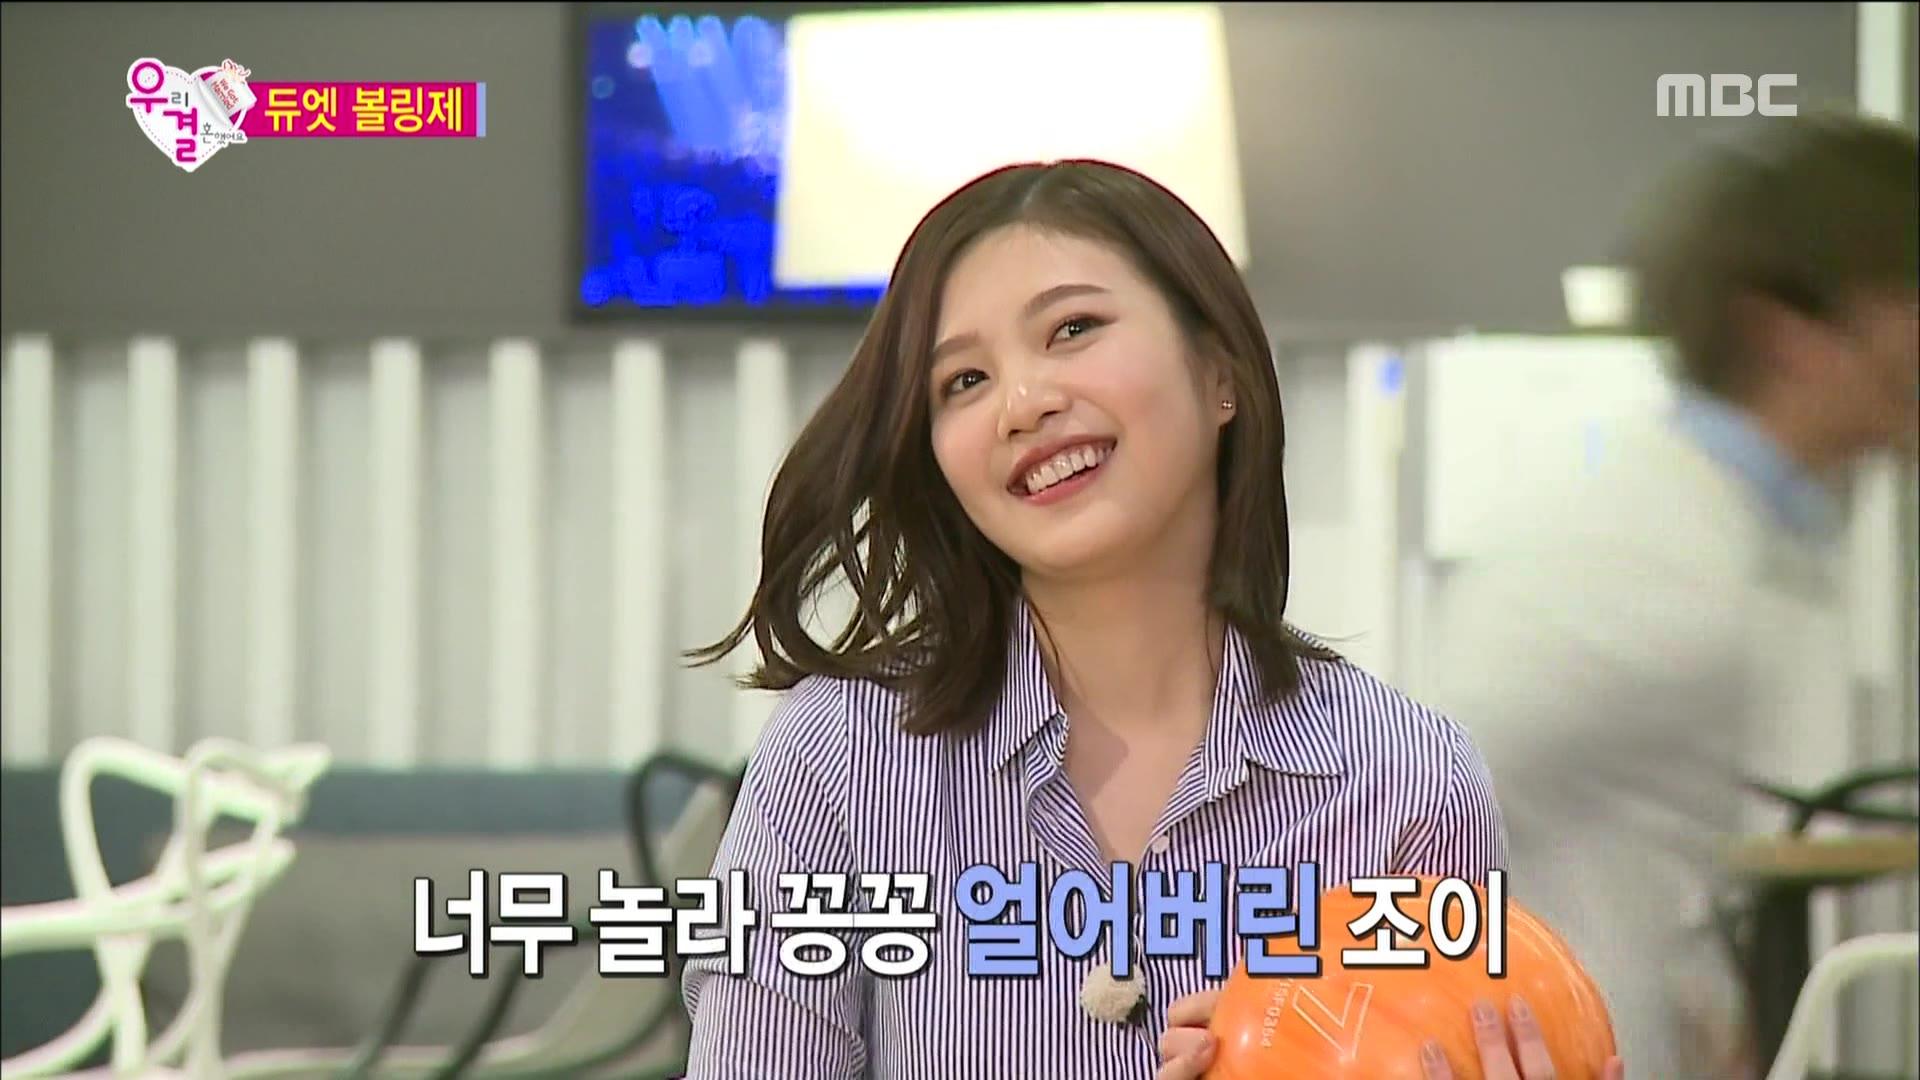 We Got Married Sub Espaol Joy Y Sungjae Ep 1 ✓ The Galleries of HD